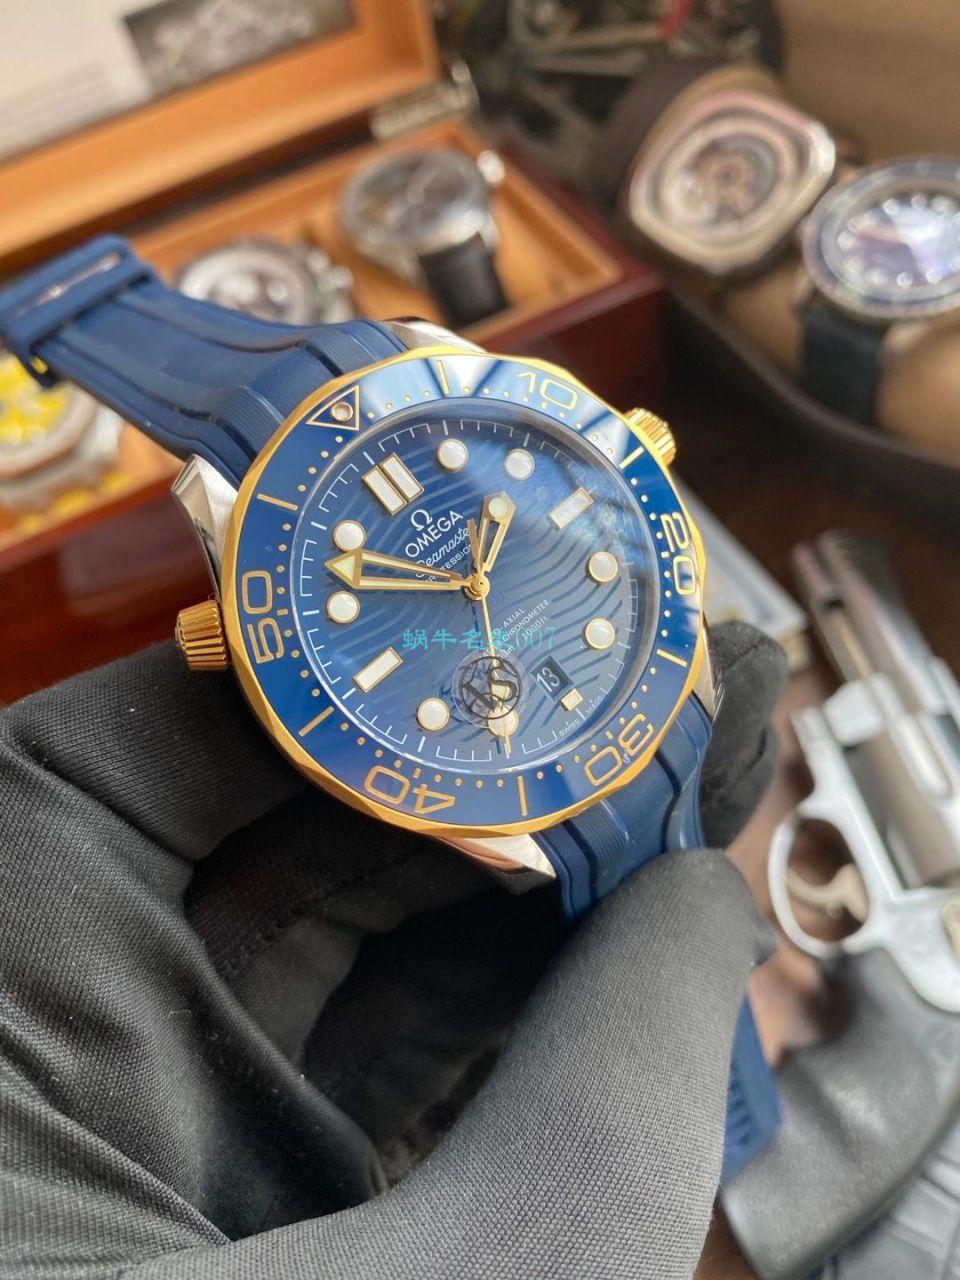 VS厂欧米茄海马300米间黄金蓝盘1比1精仿手表210.22.42.20.03.001腕表 / VS781